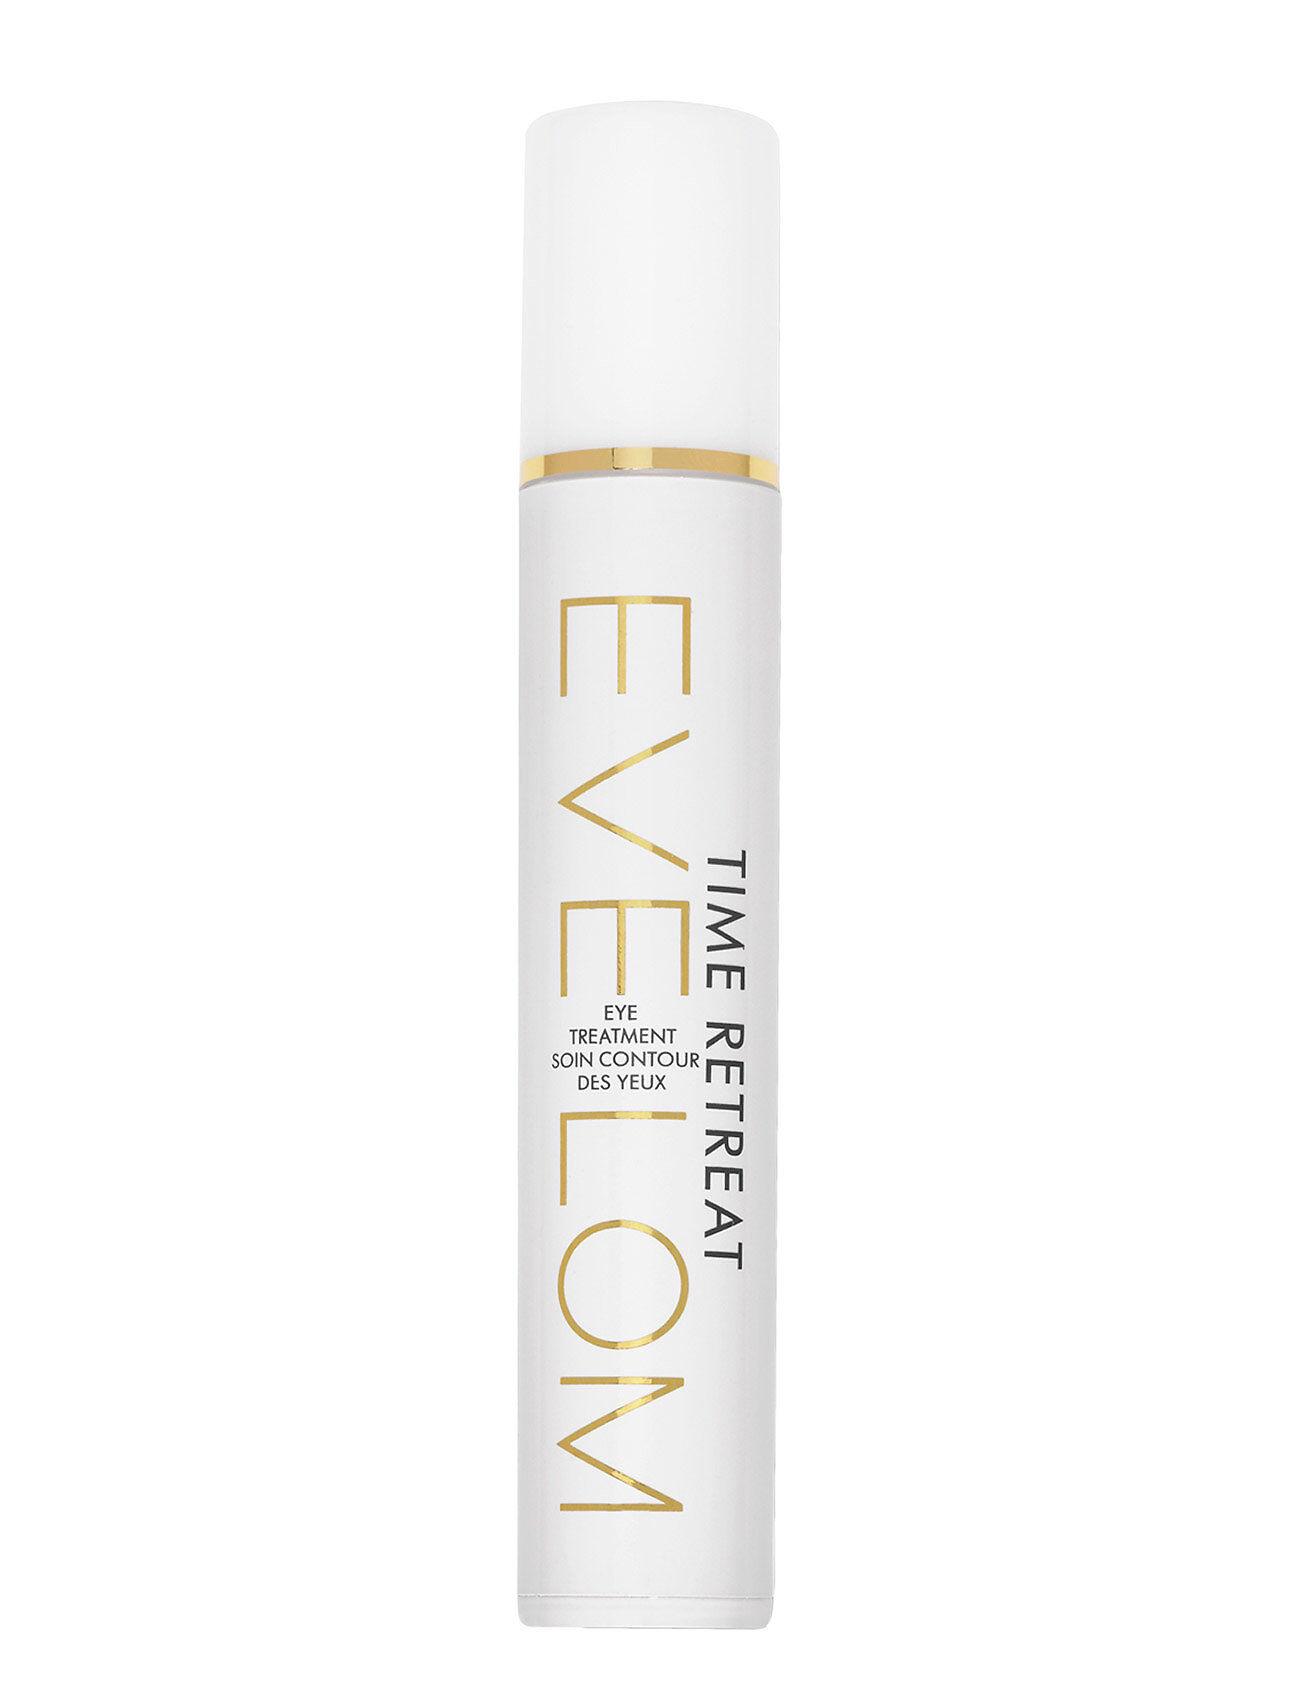 EVE LOM Time Retreat Eye Treatment Beauty WOMEN Skin Care Face Eye Cream Nude